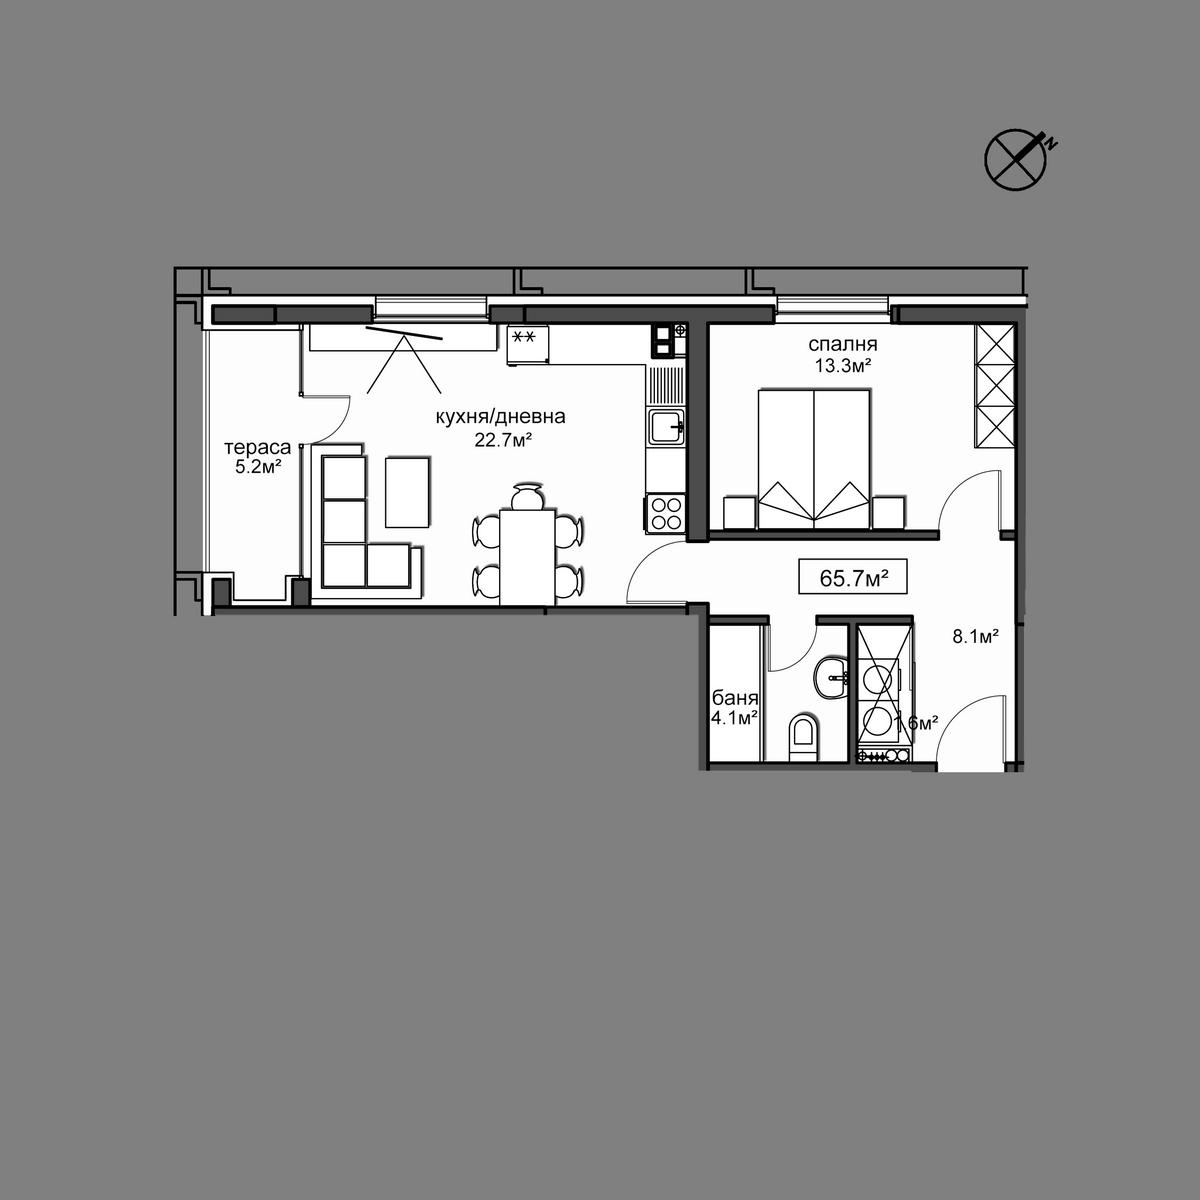 Продава апартамент ново строителство - Апартамент 8